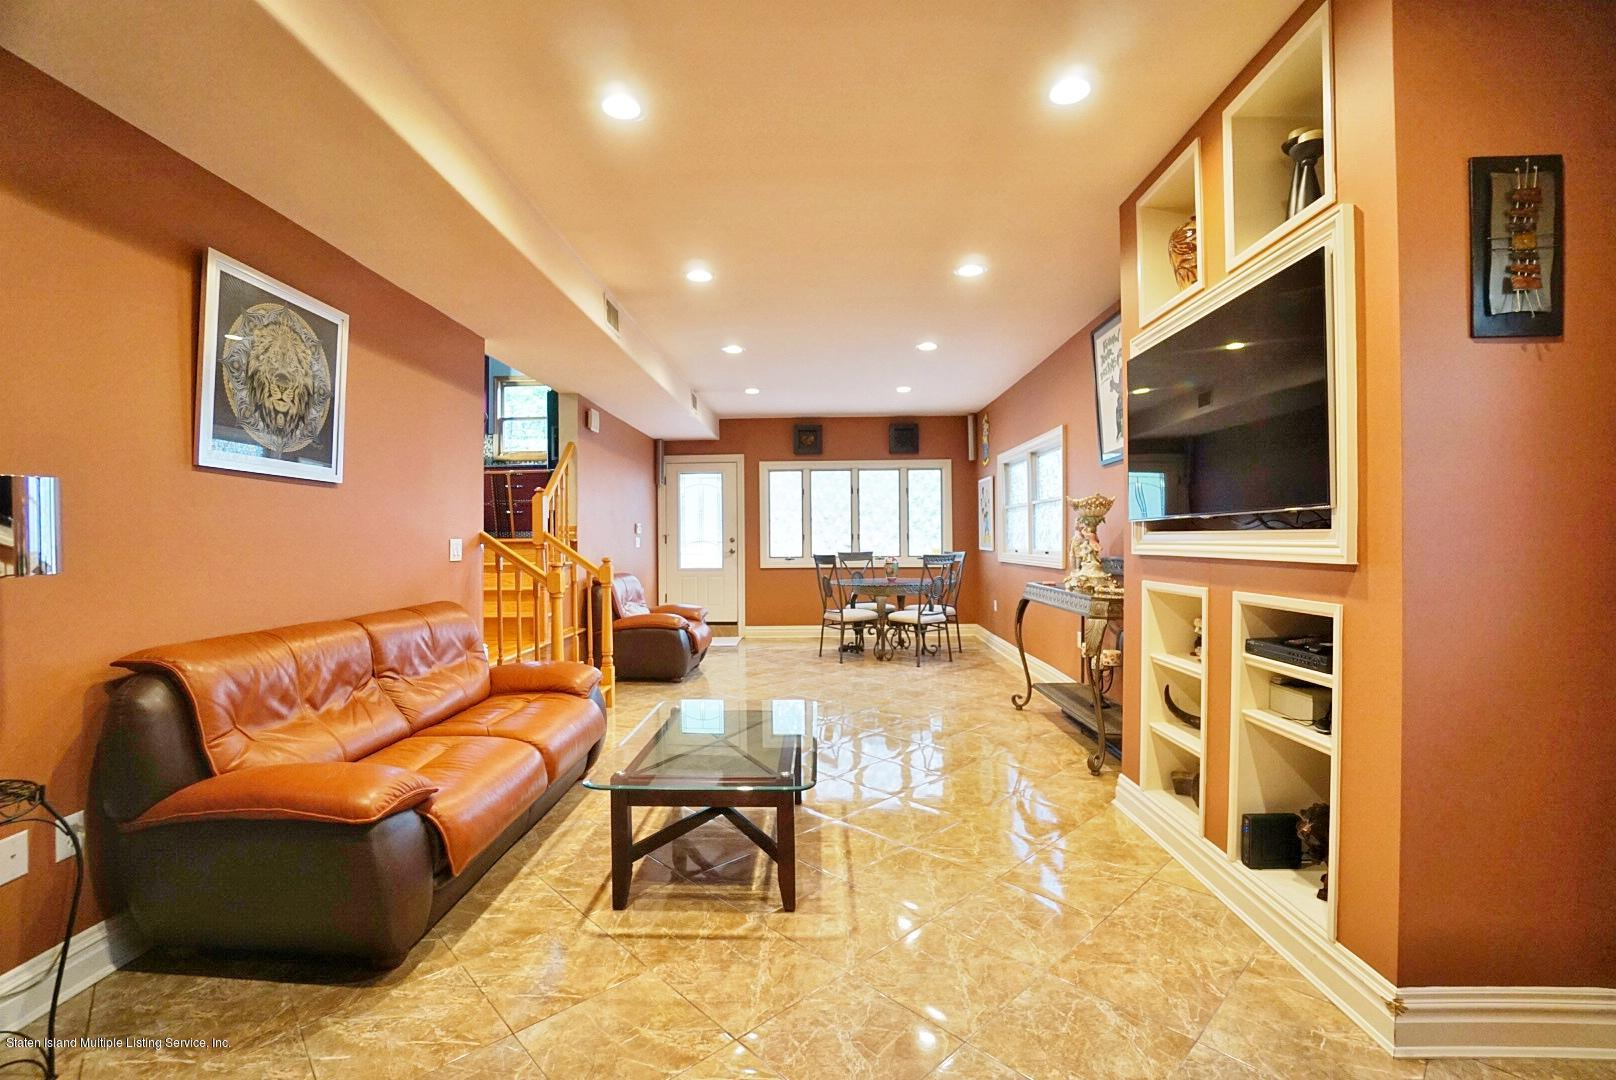 Single Family - Detached 48 Ocean Terrace  Staten Island, NY 10314, MLS-1130826-30